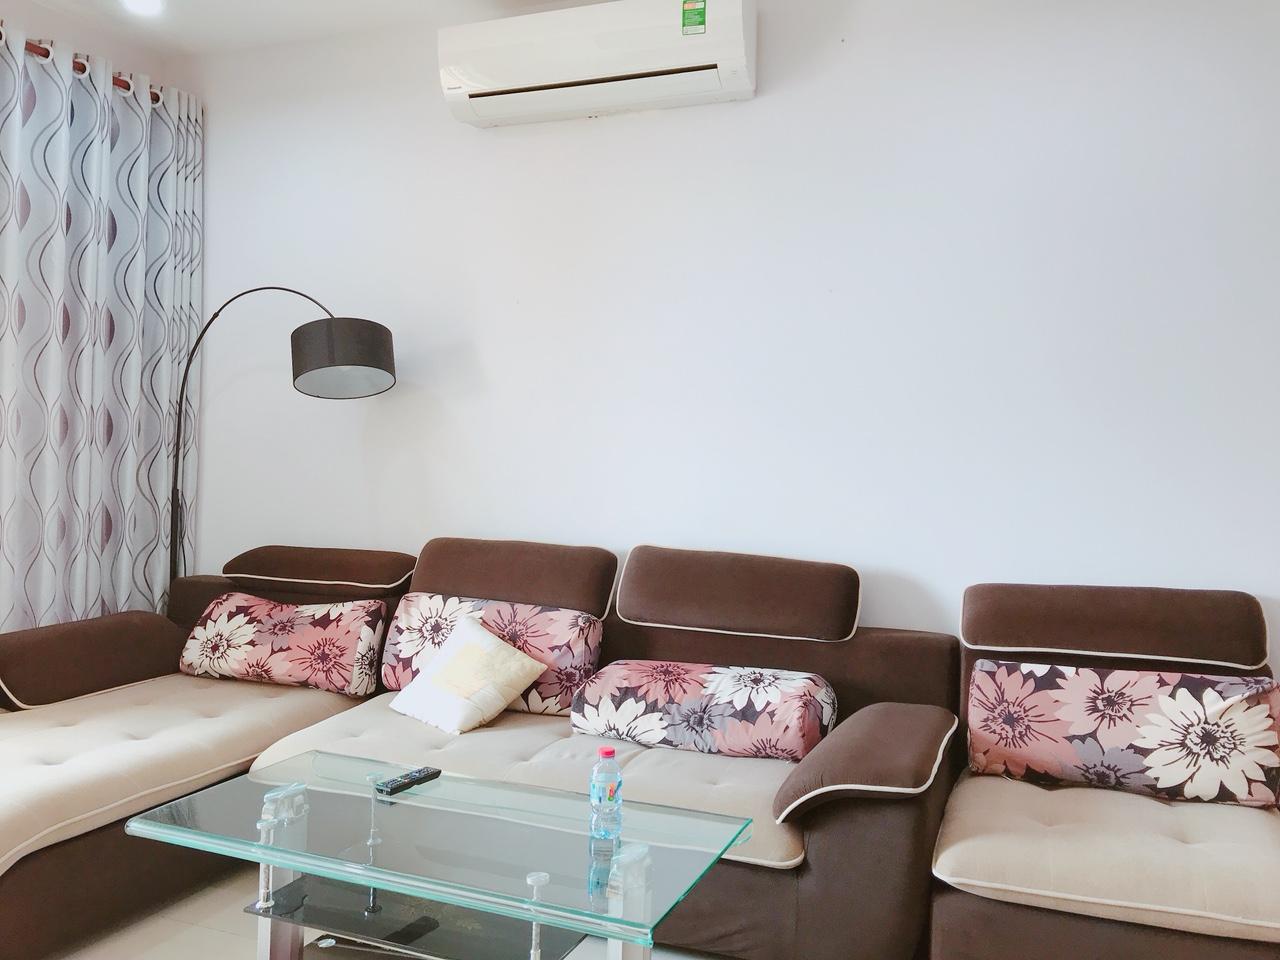 VP2.37- 2 BEDROOMS APARTMENT FOR RENT AT VUNG TAU PLAZA | Villa For Rent